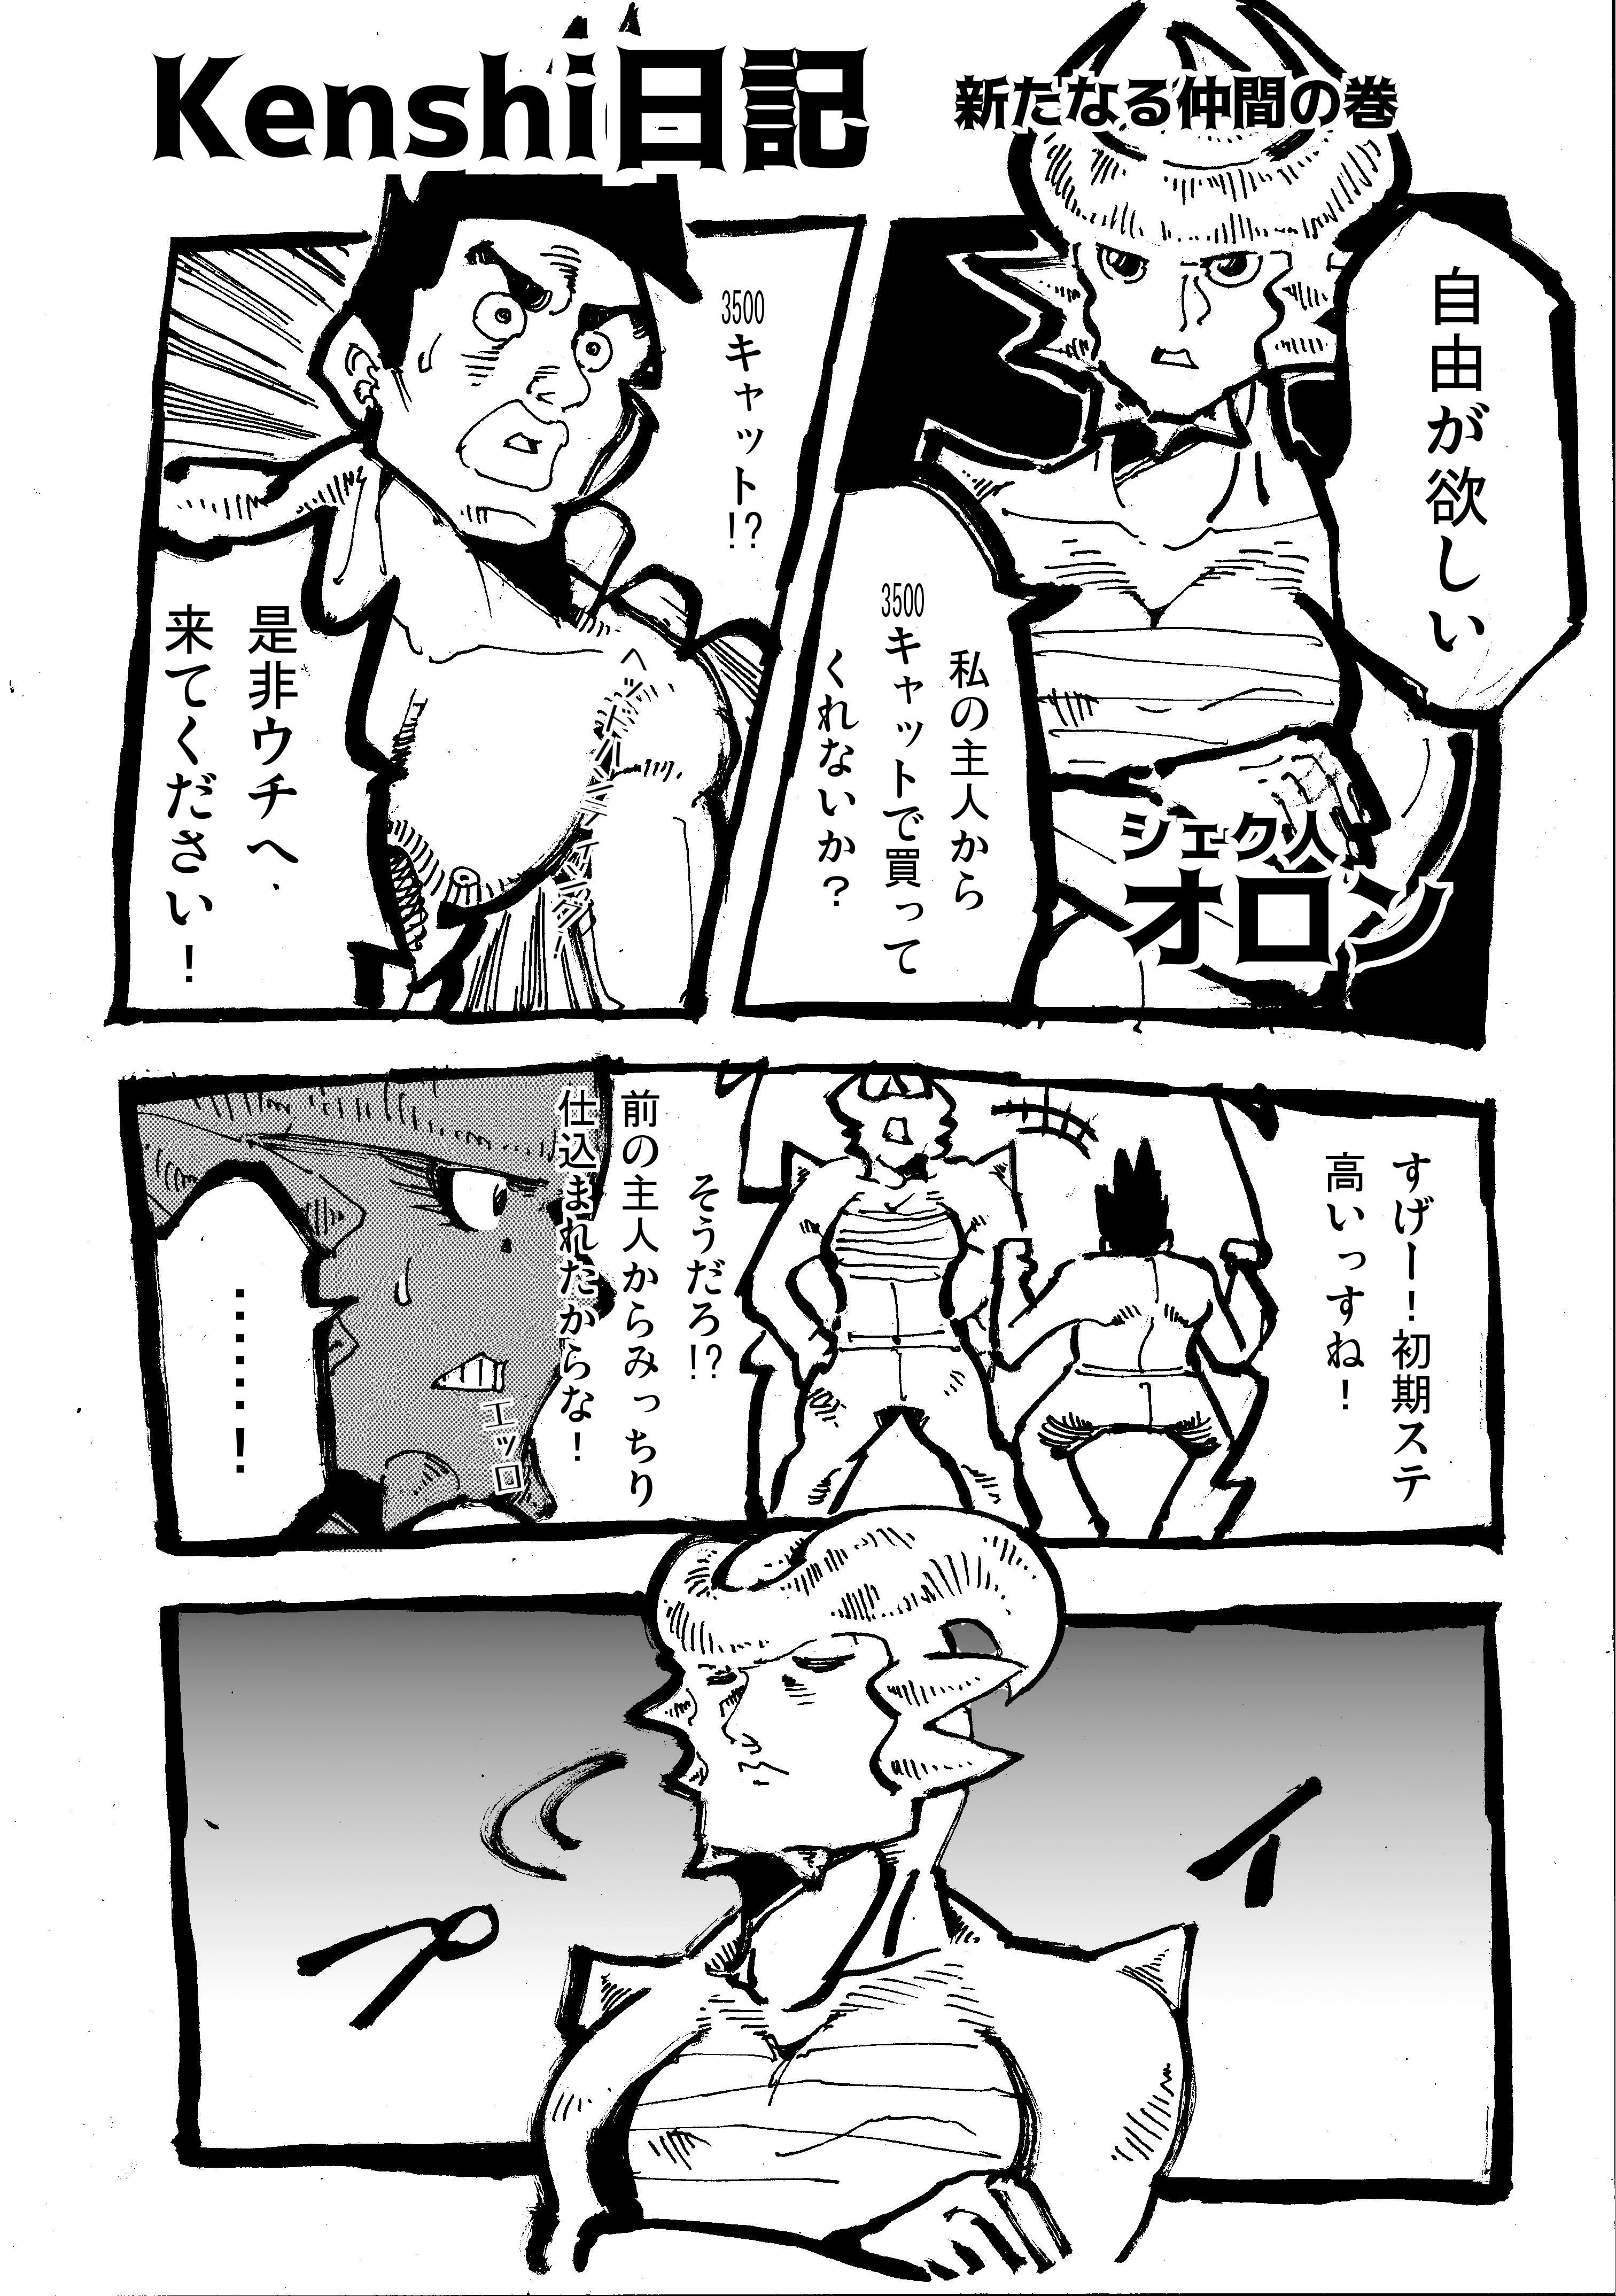 Kenshi日記4 新たなる仲間の巻